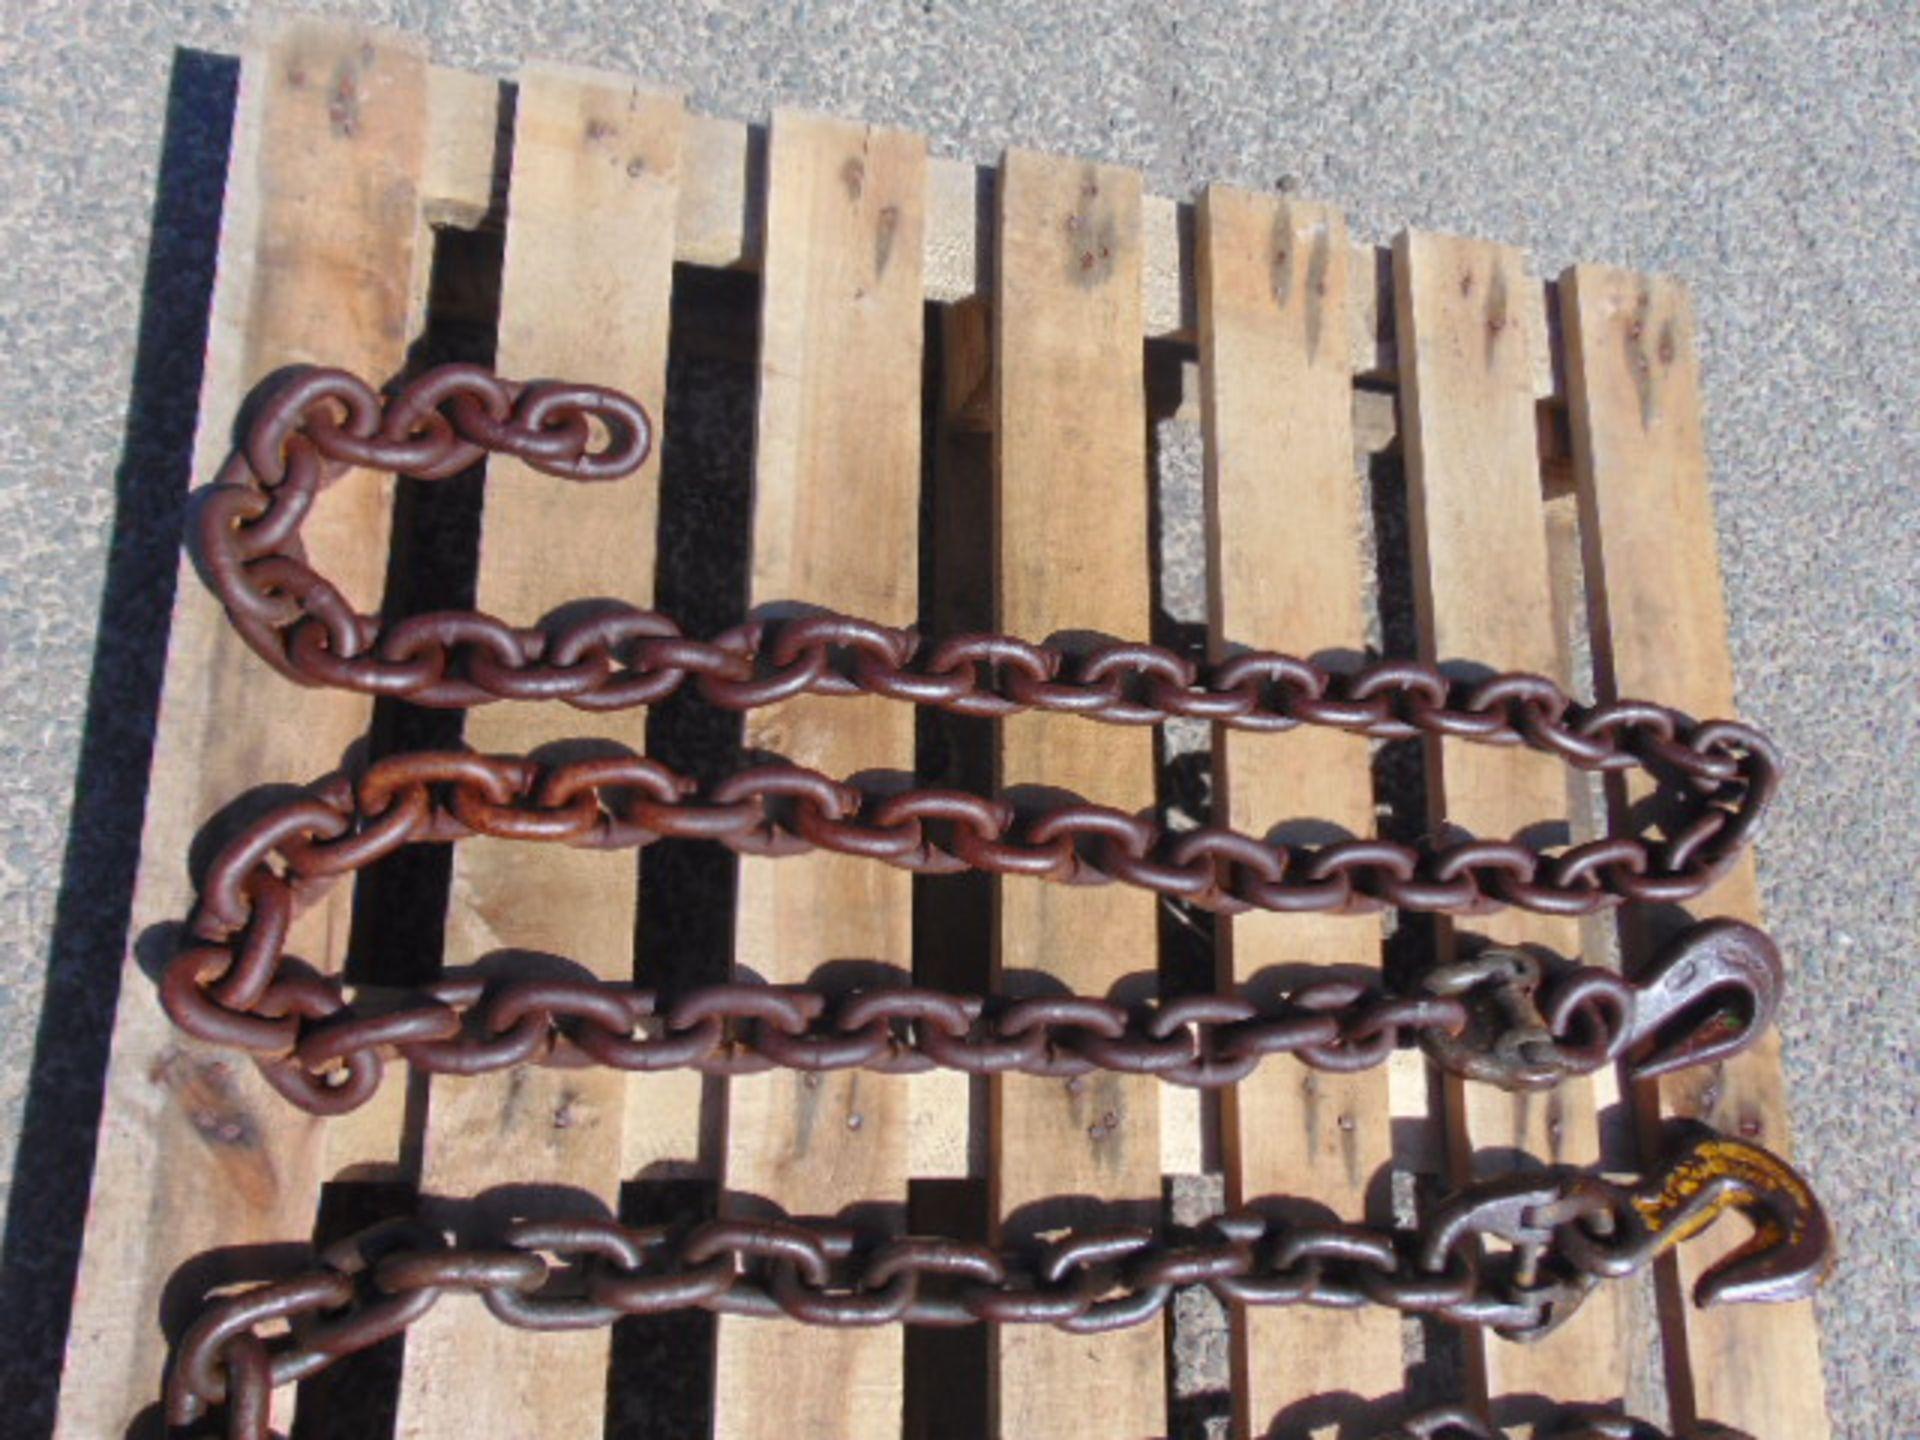 Lot 24165 - 2 x Heavy Duty Chain Assys